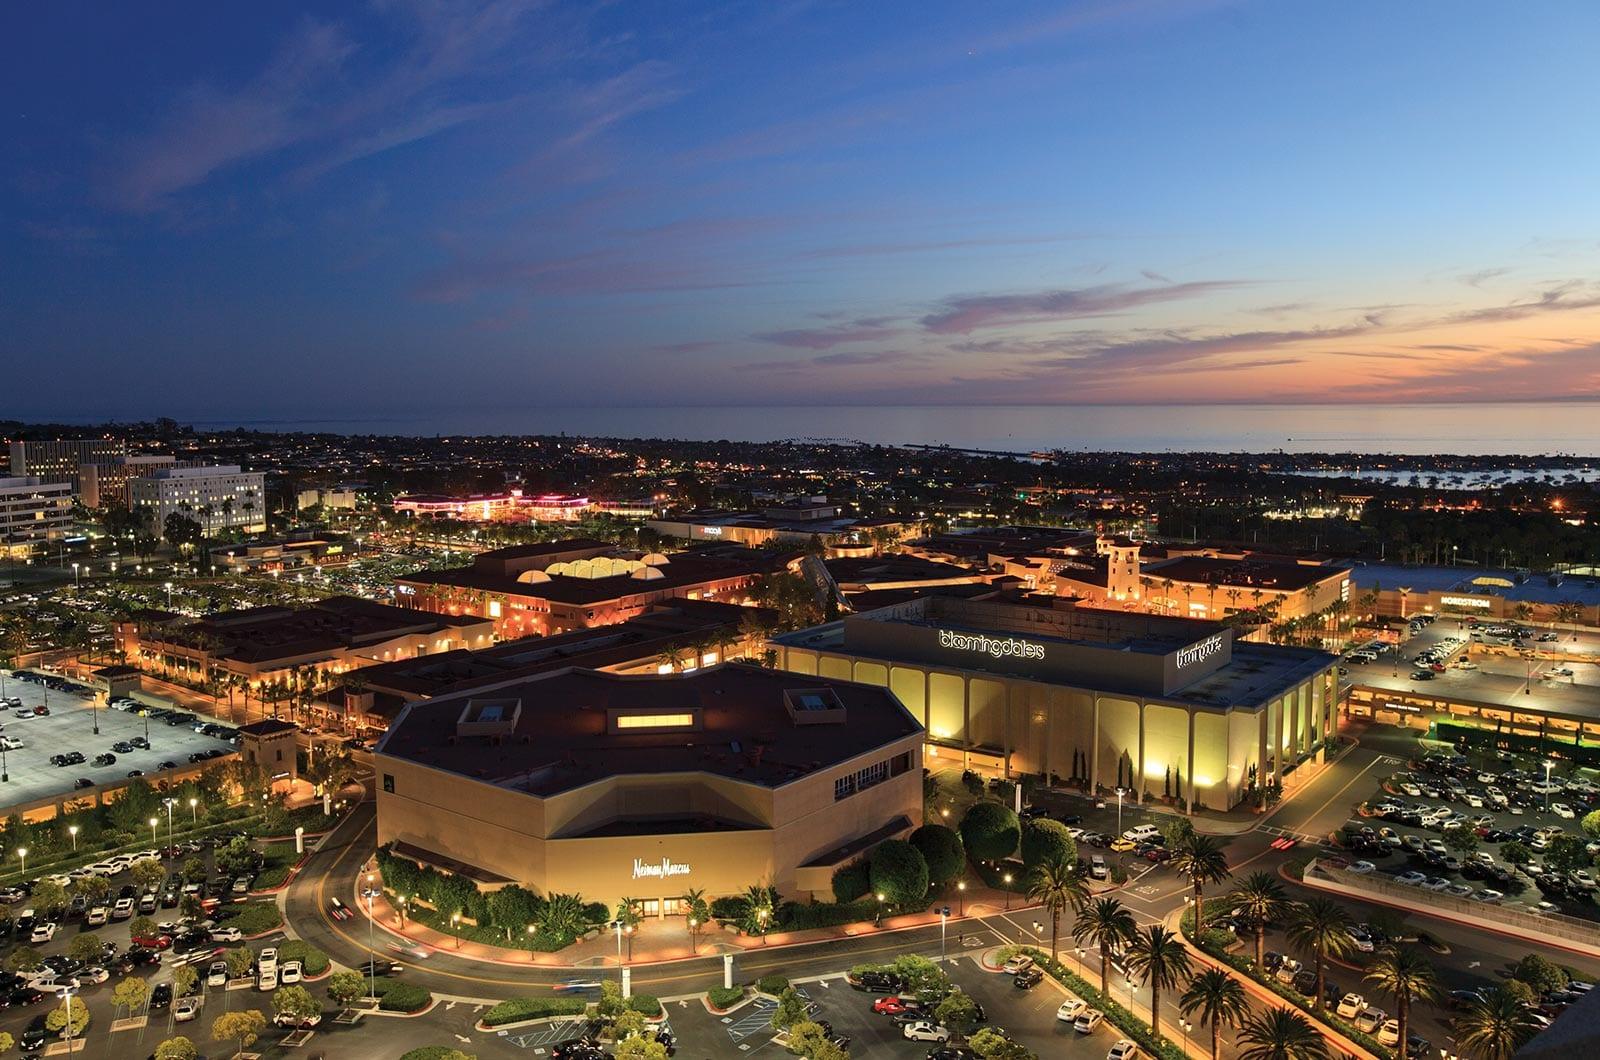 Costa Mesa 3D Tour Service Provider | Costa Mesa Virtual Tour Photographer | Costa Mesa Aerial Photography Services | Costa Mesa HDR Luxury Real Estate Photography Services